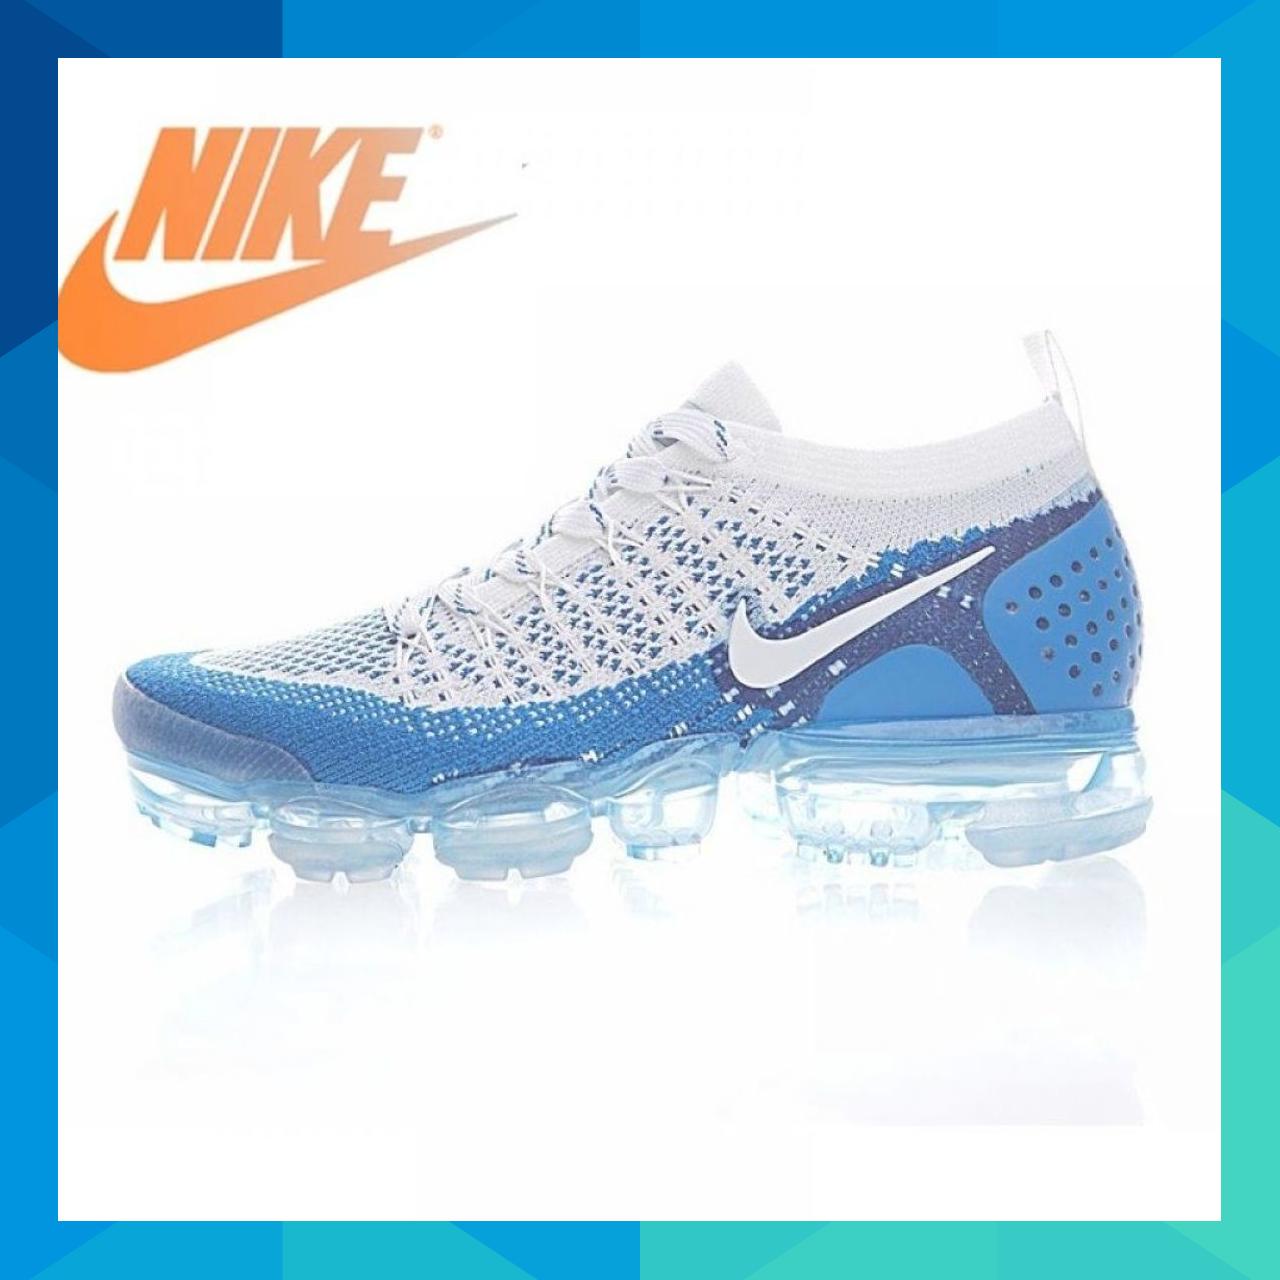 Original Nike Air Vapormax Flyknit 2 Running Shoes Price